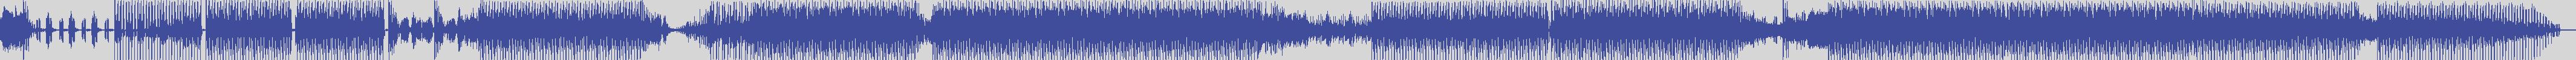 just_digital_records [JS1406] Sugar Freak - Music Change My Life [Da Lukas Tribe Mix] audio wave form